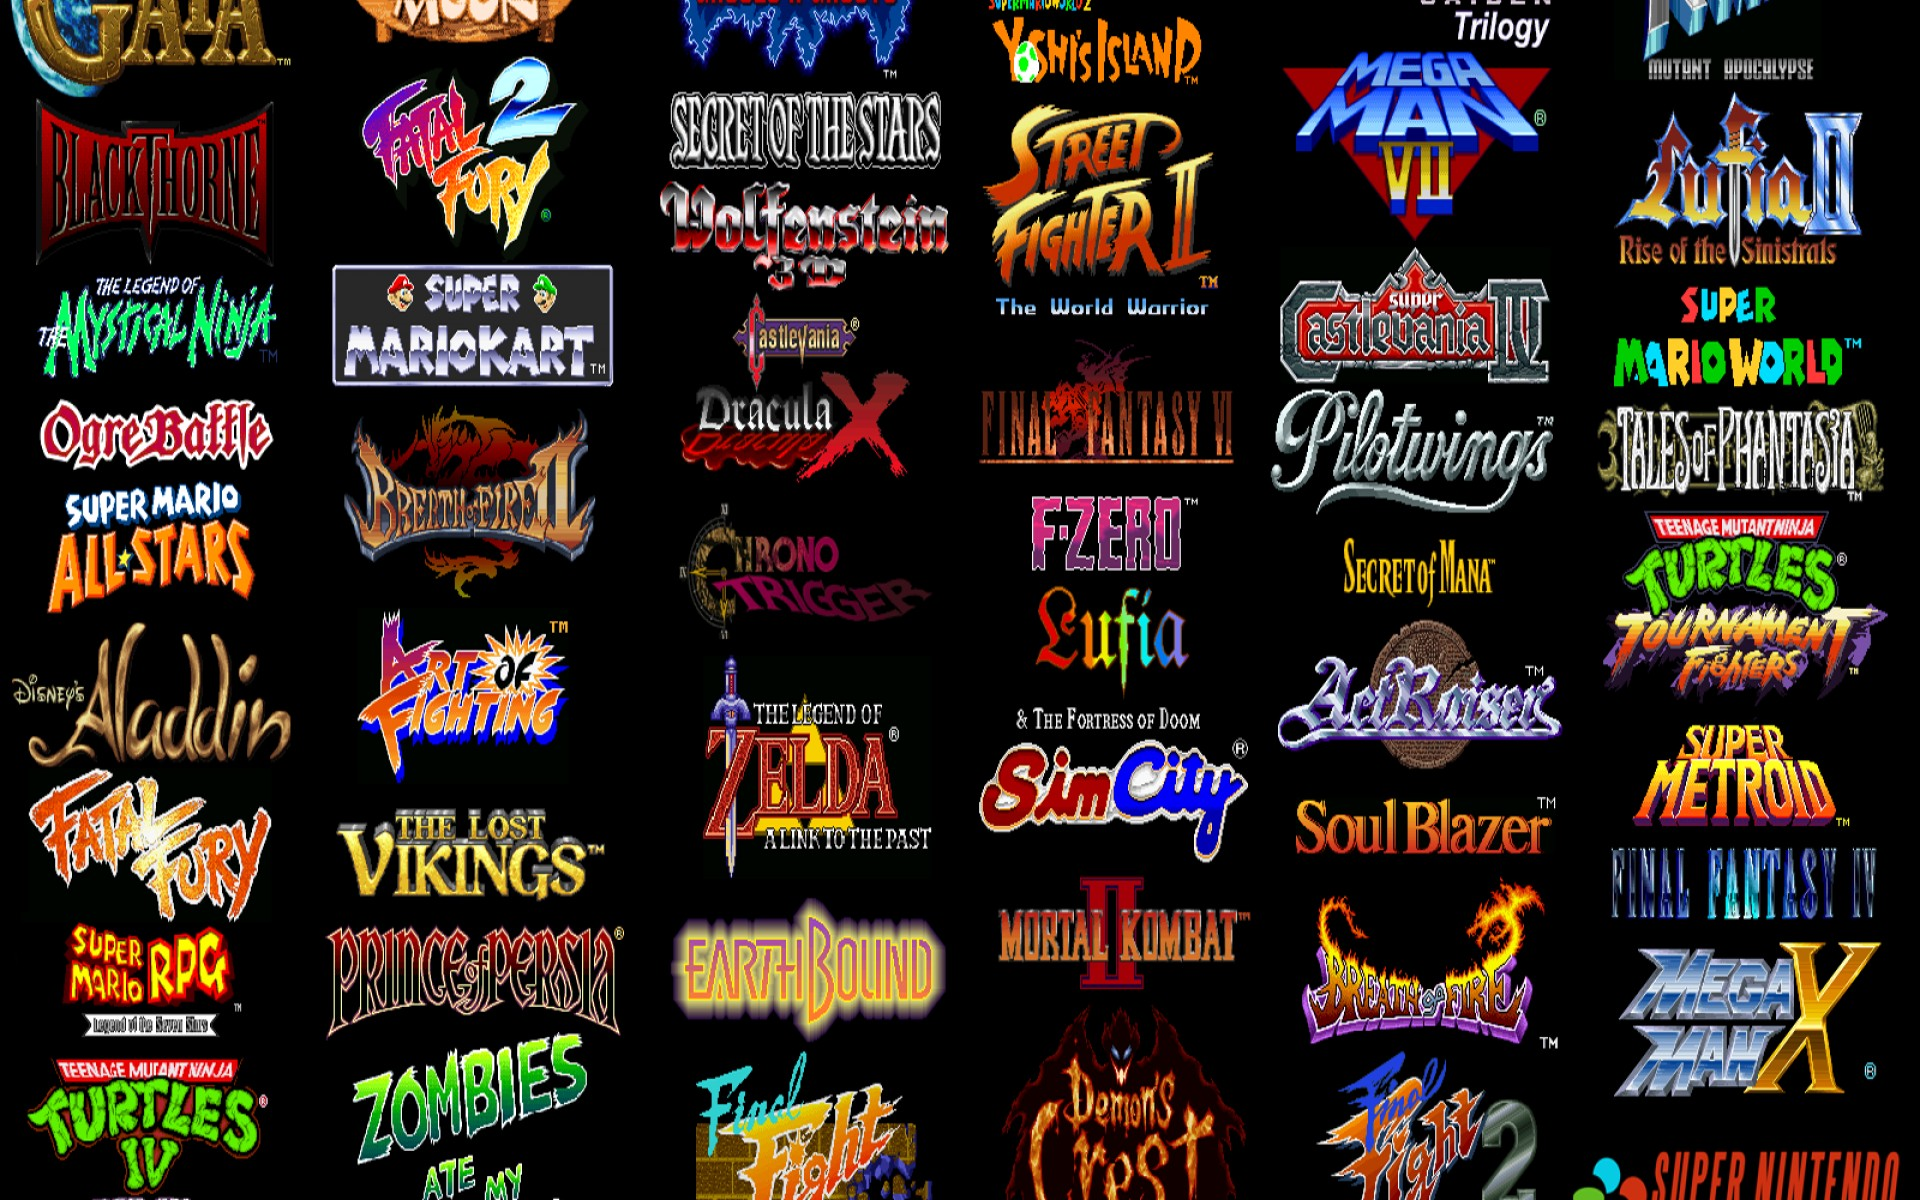 Free download Video games super nintendo retro games wallpaper